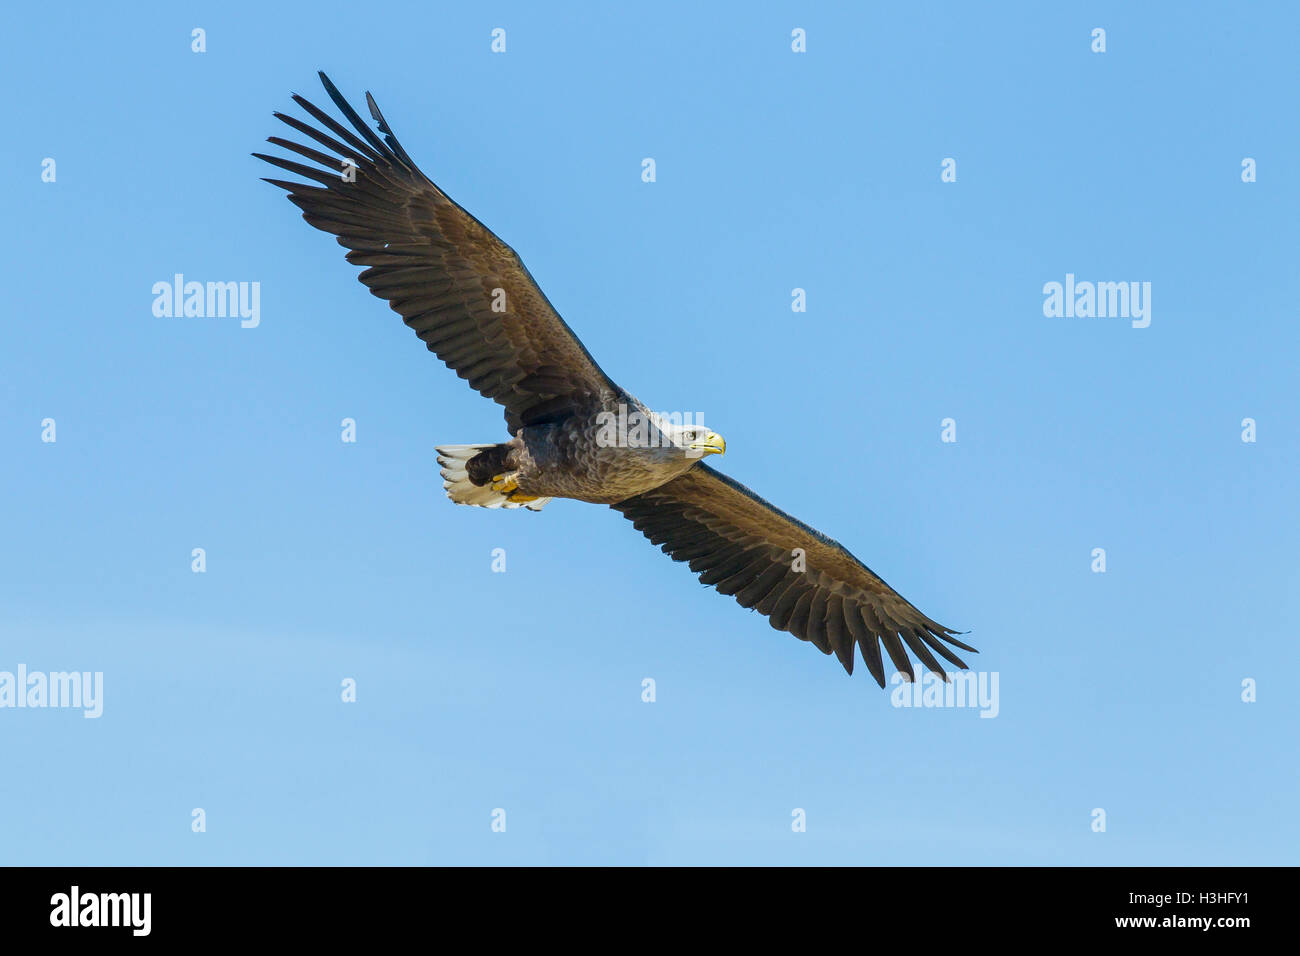 white-tailed sea eagle (Haliaeetus albicilla) adult in flight against blue sky, Norway Stock Photo